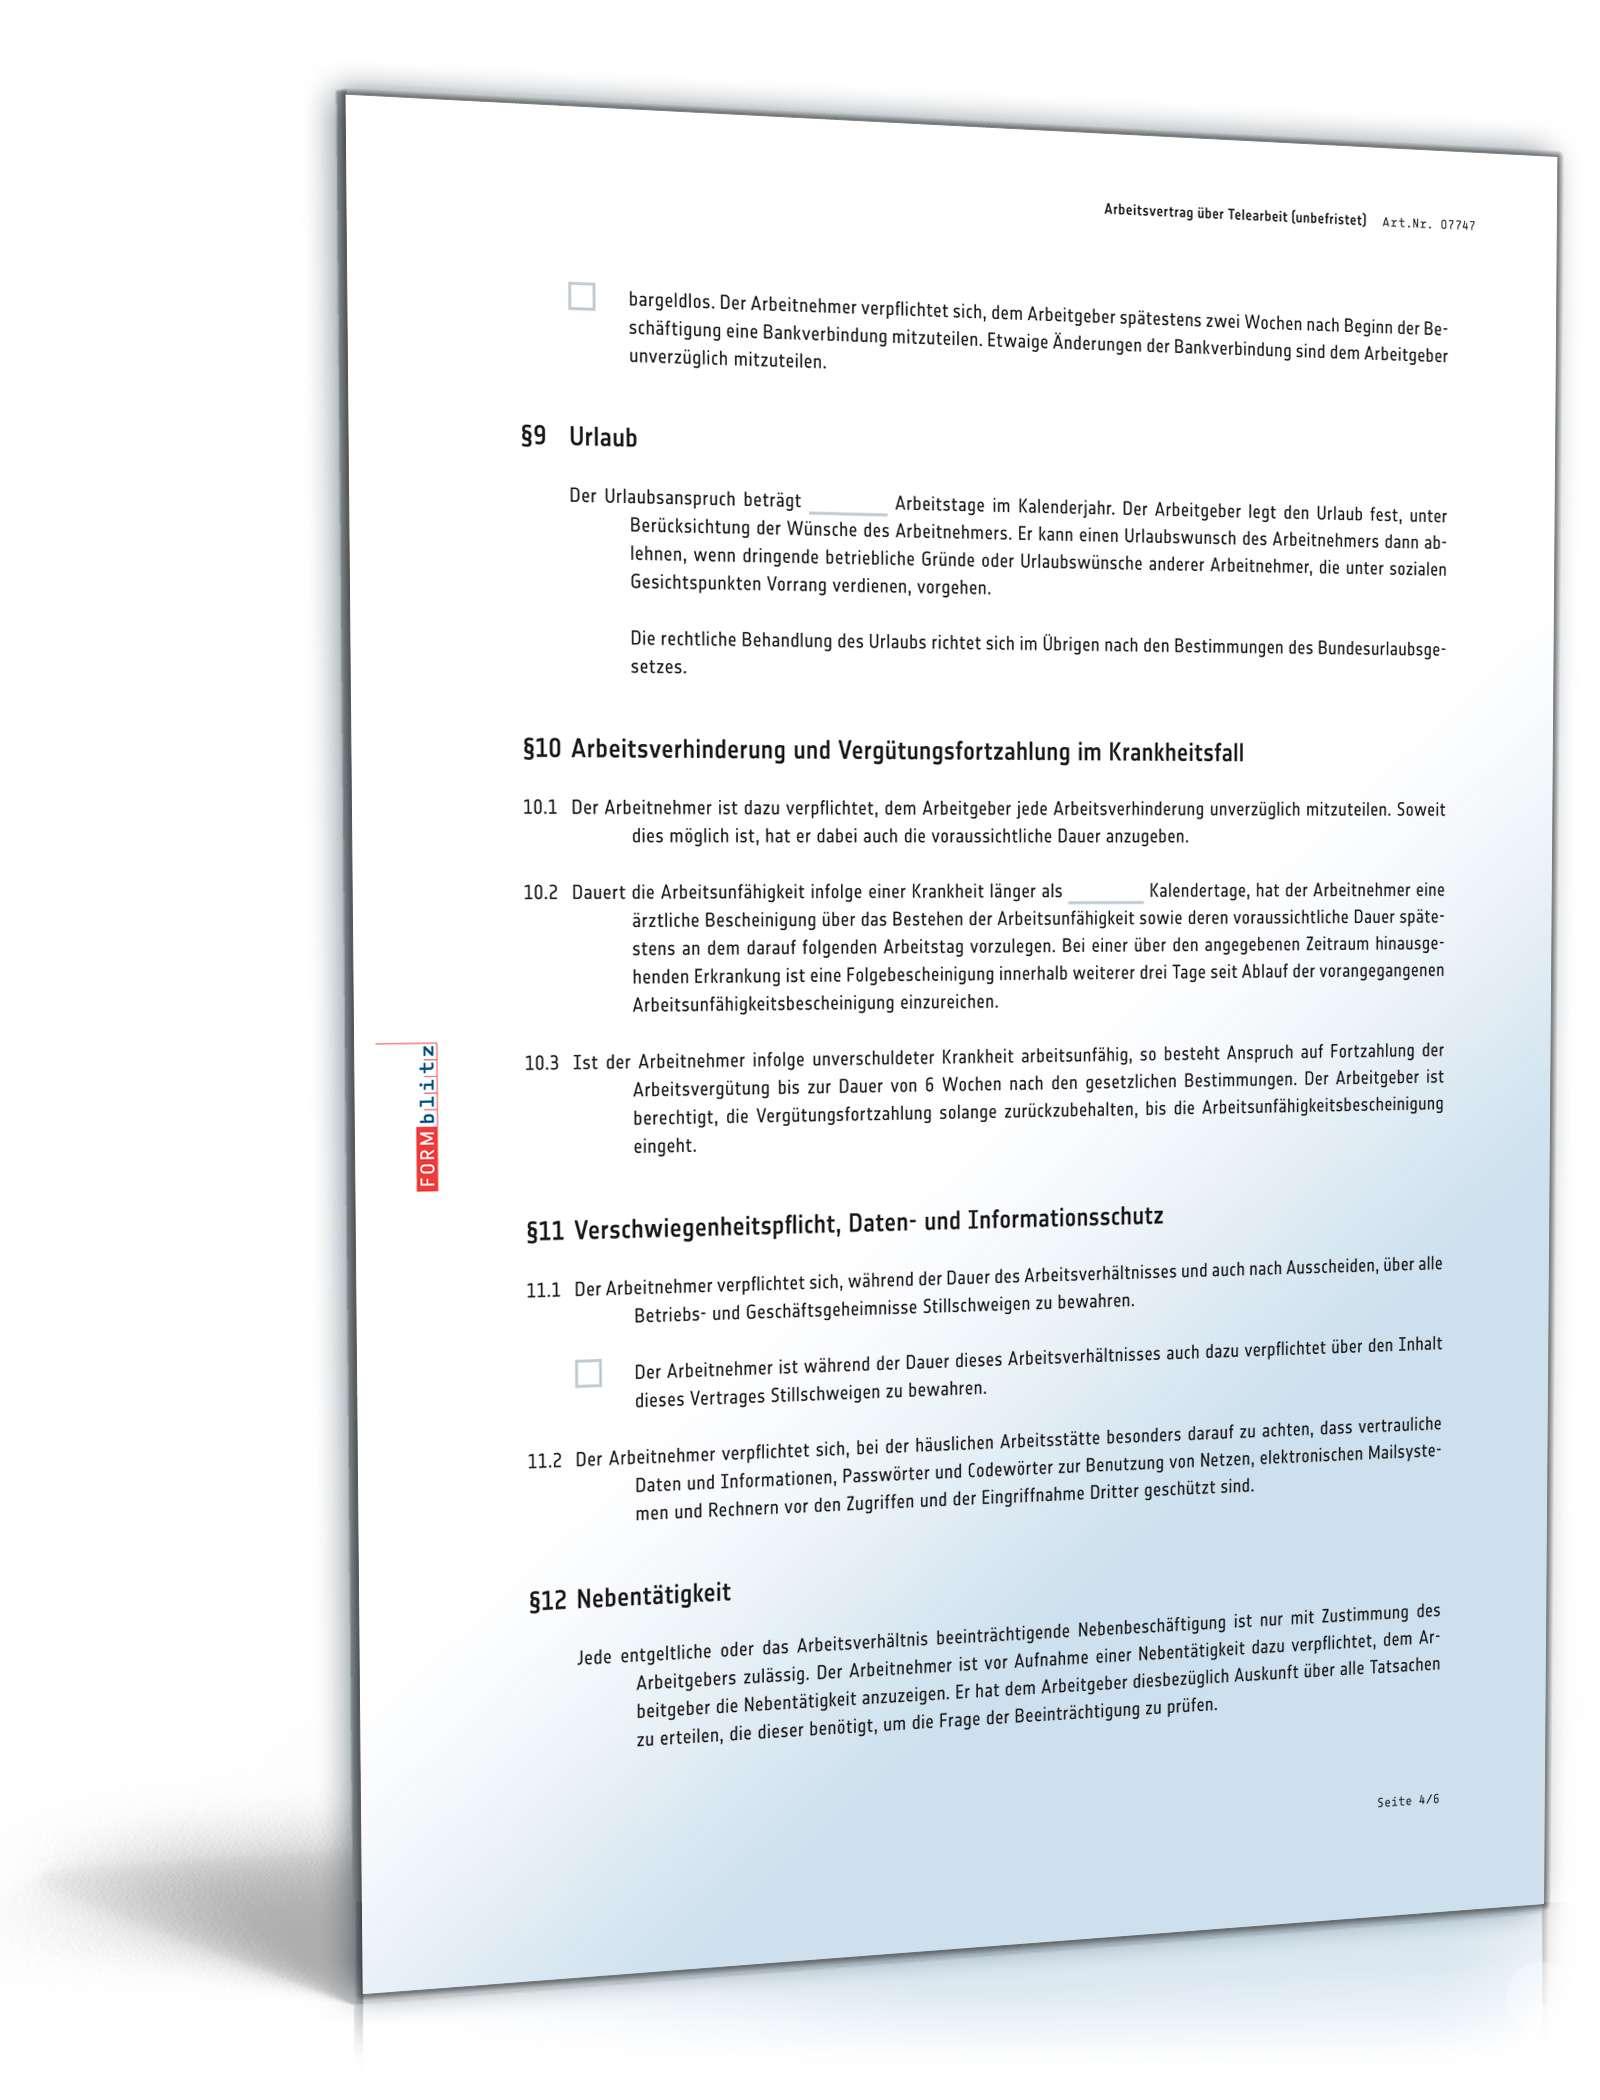 book somatostatin analogs in